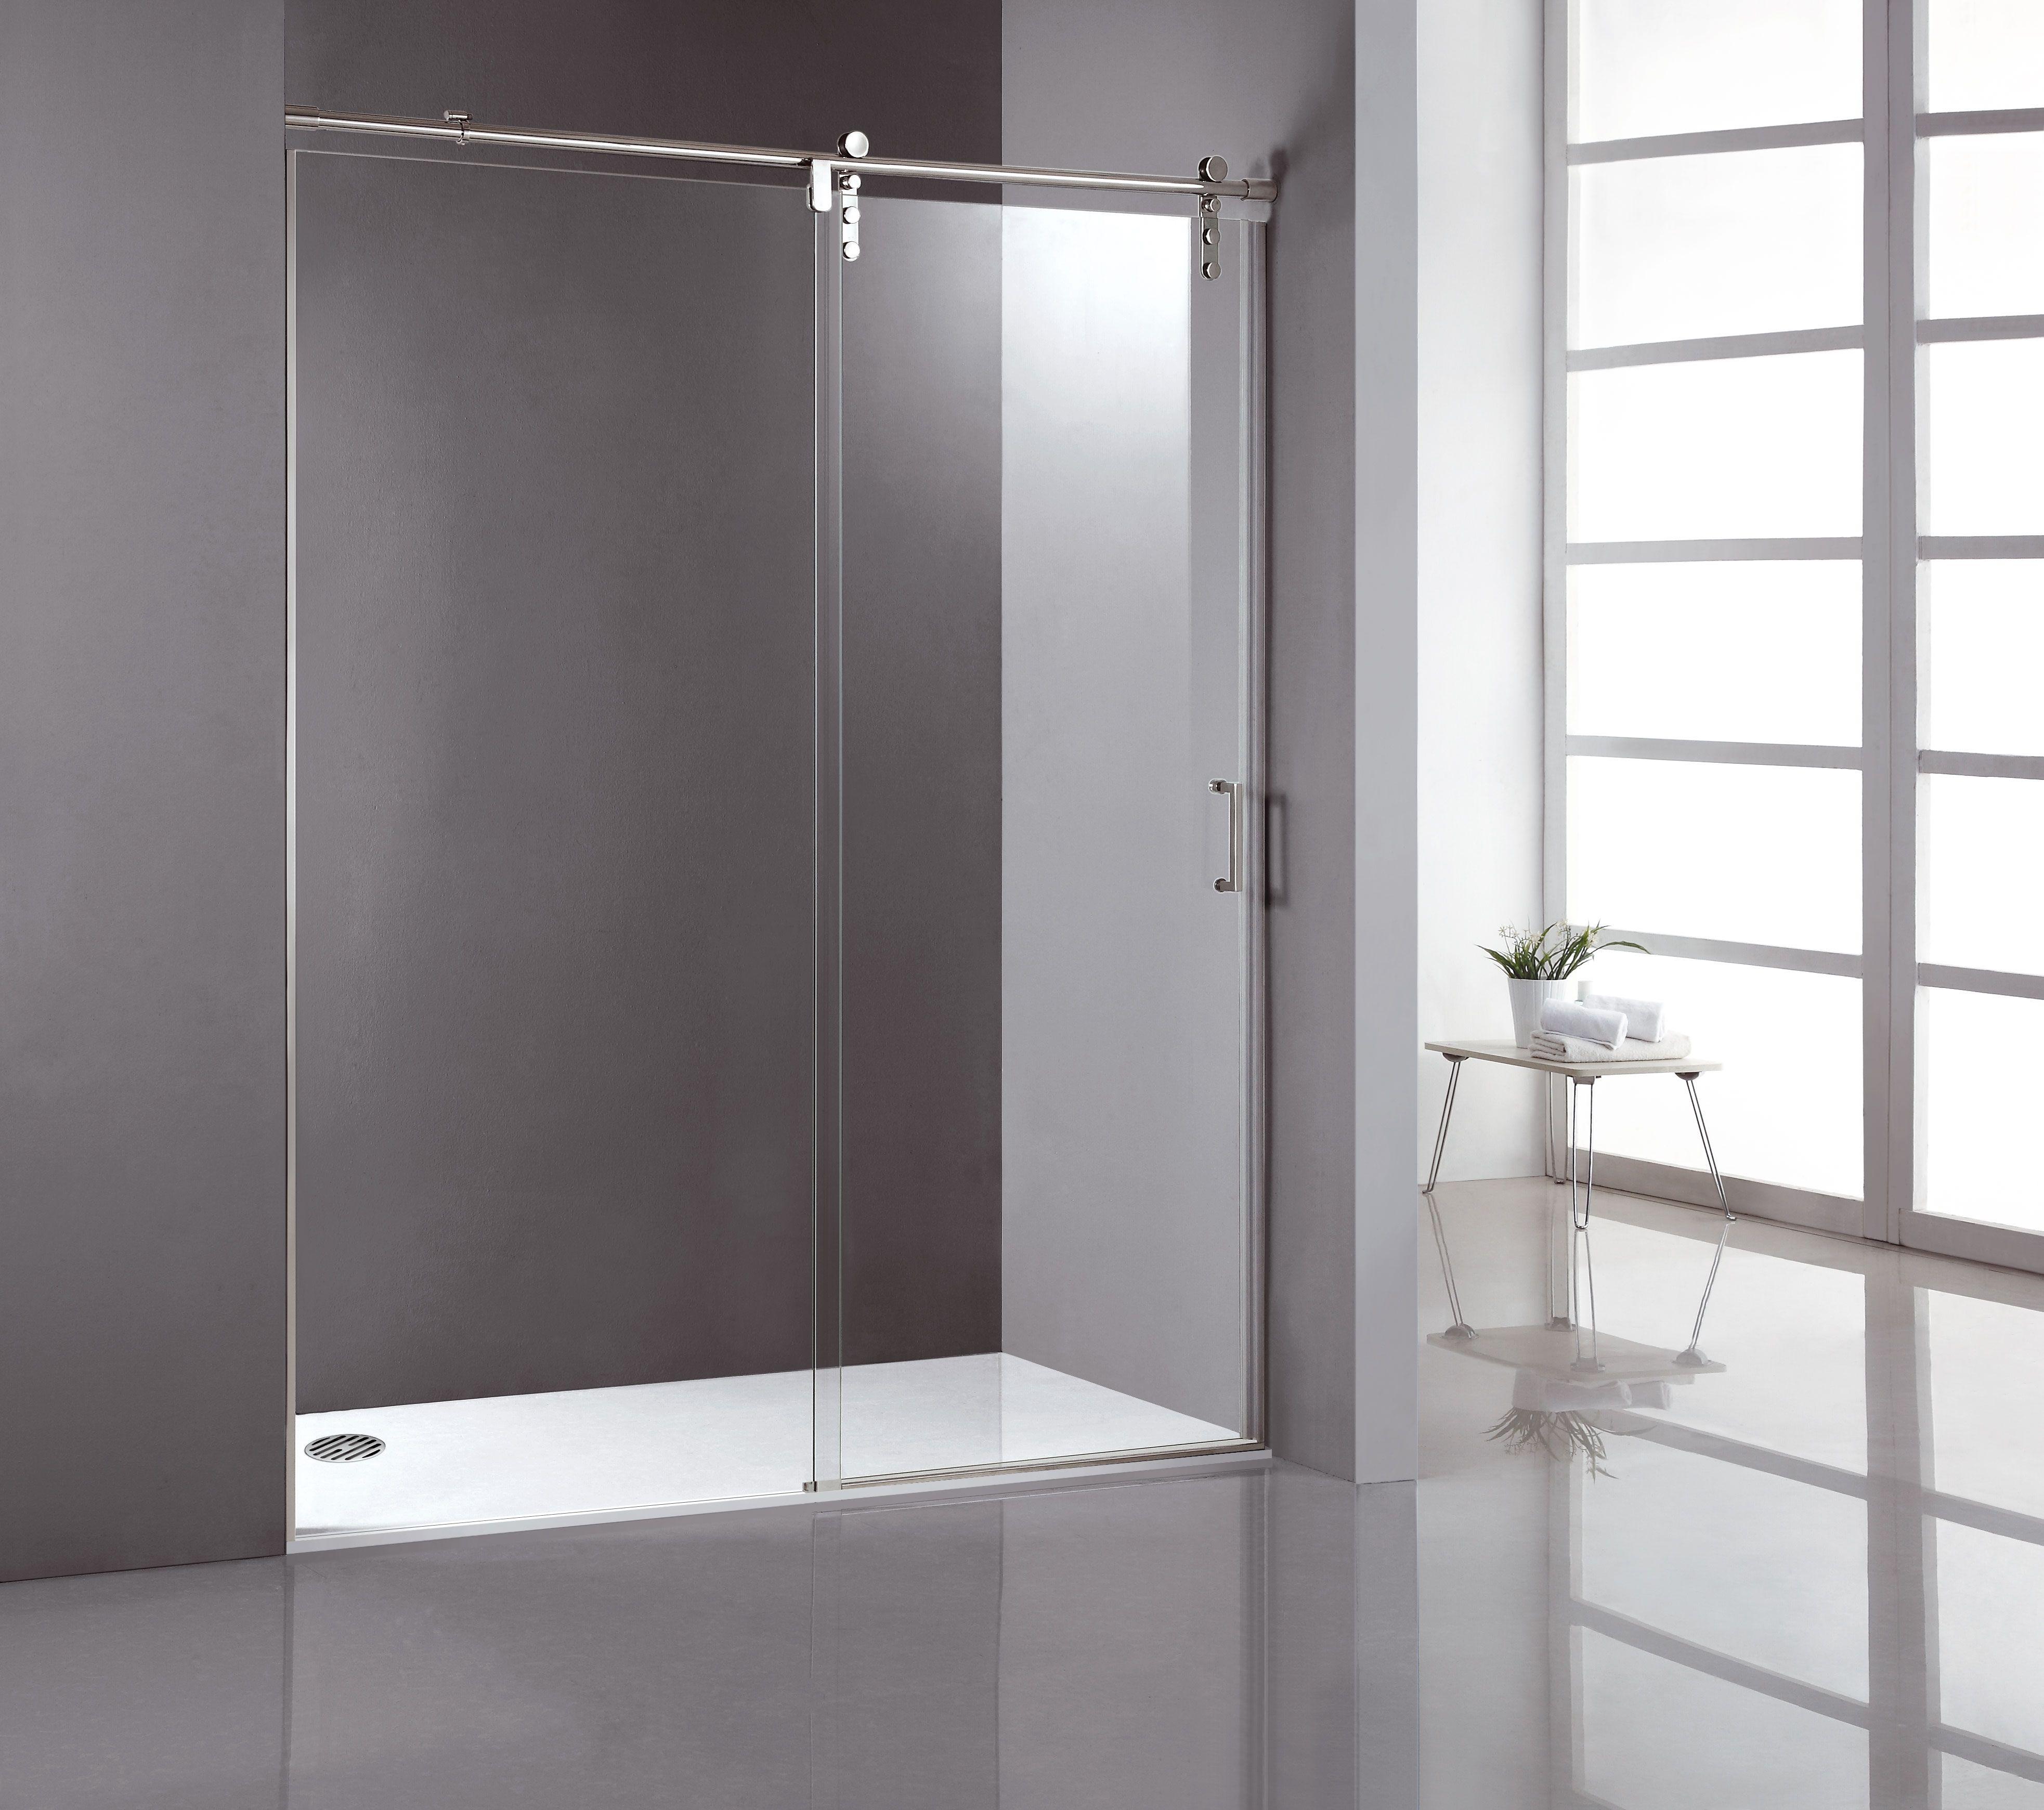 Mampara ducha ca la cristi pinterest mampara duchas y buscar con google - Duchas para bano ...